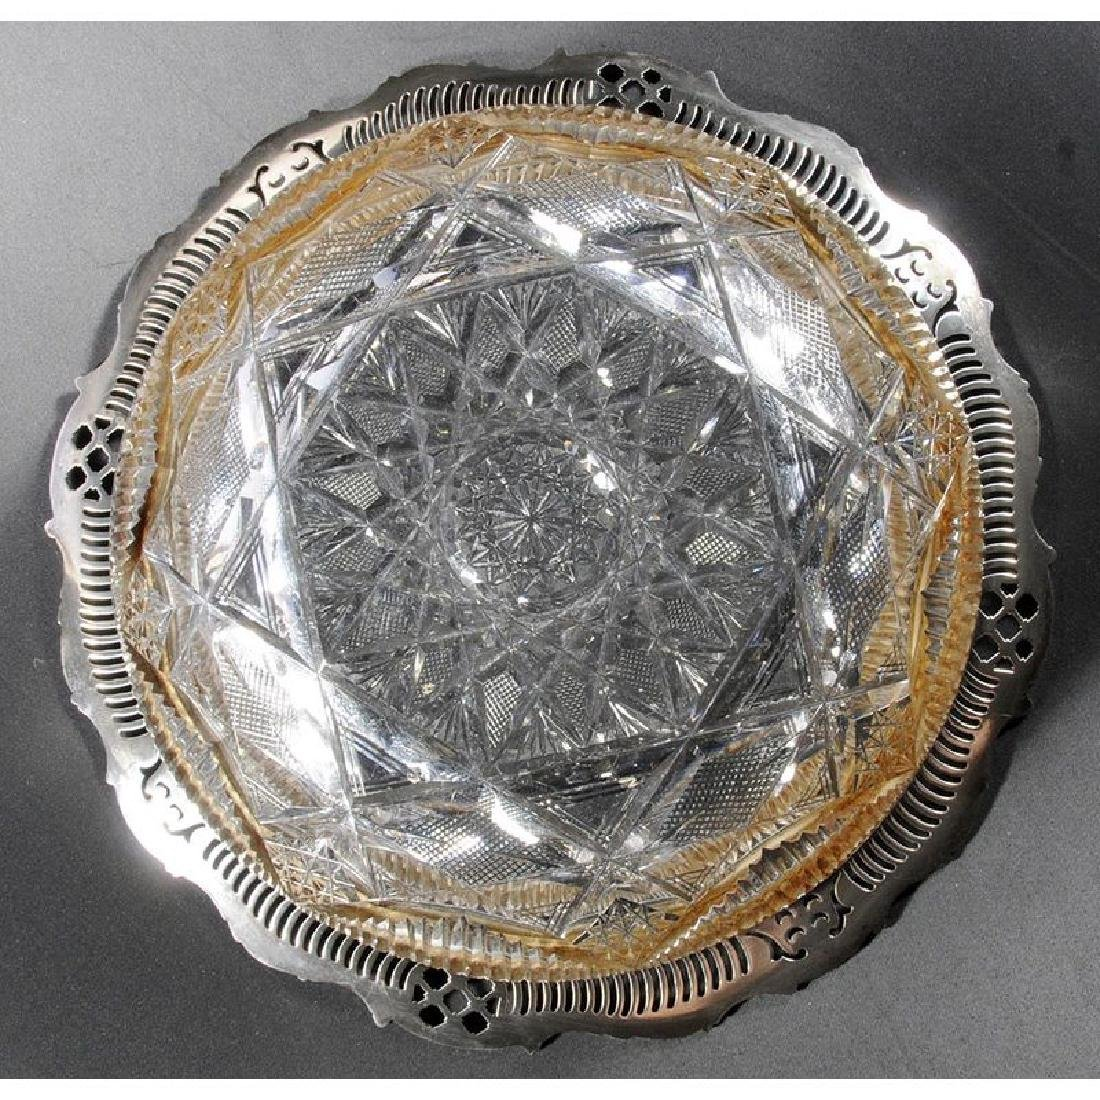 Hoare Brilliant Period Cut Glass Bowl - 4